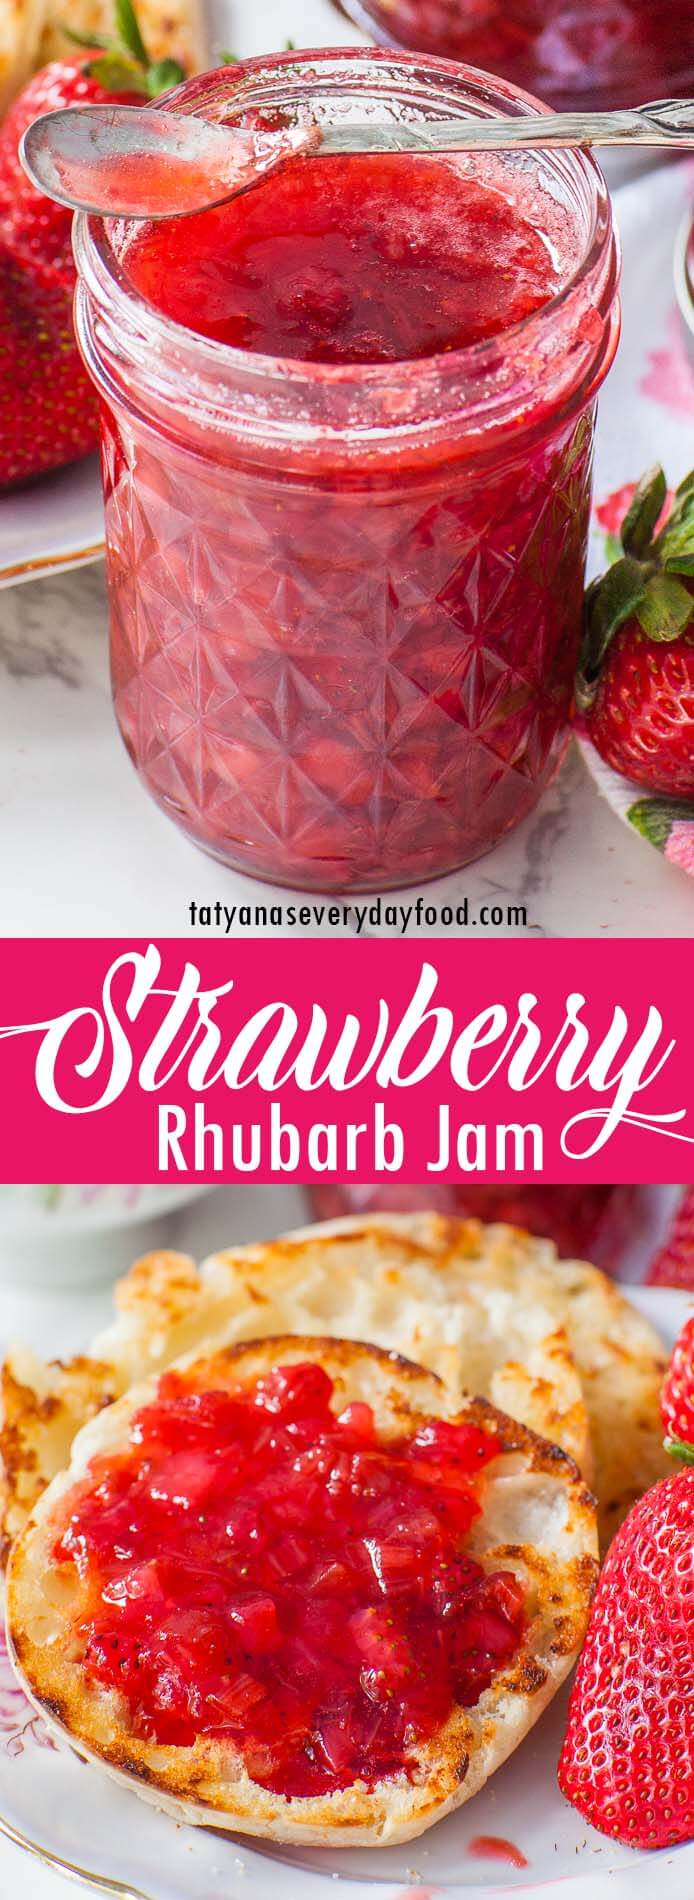 Strawberry Rhubarb Jam video recipe